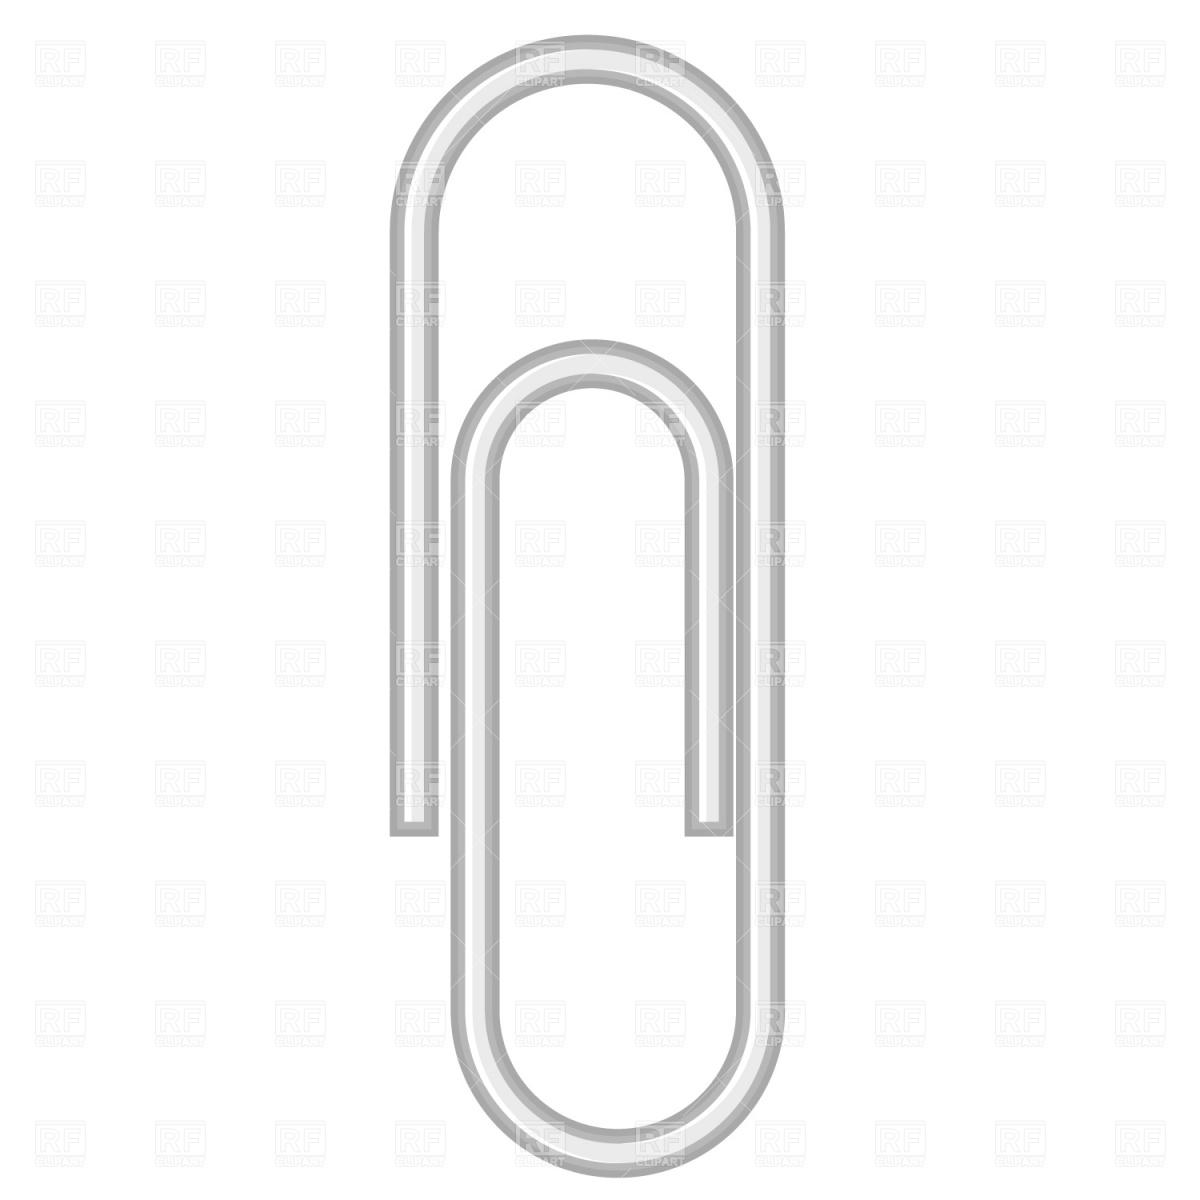 14 Paper Clip Vector Images